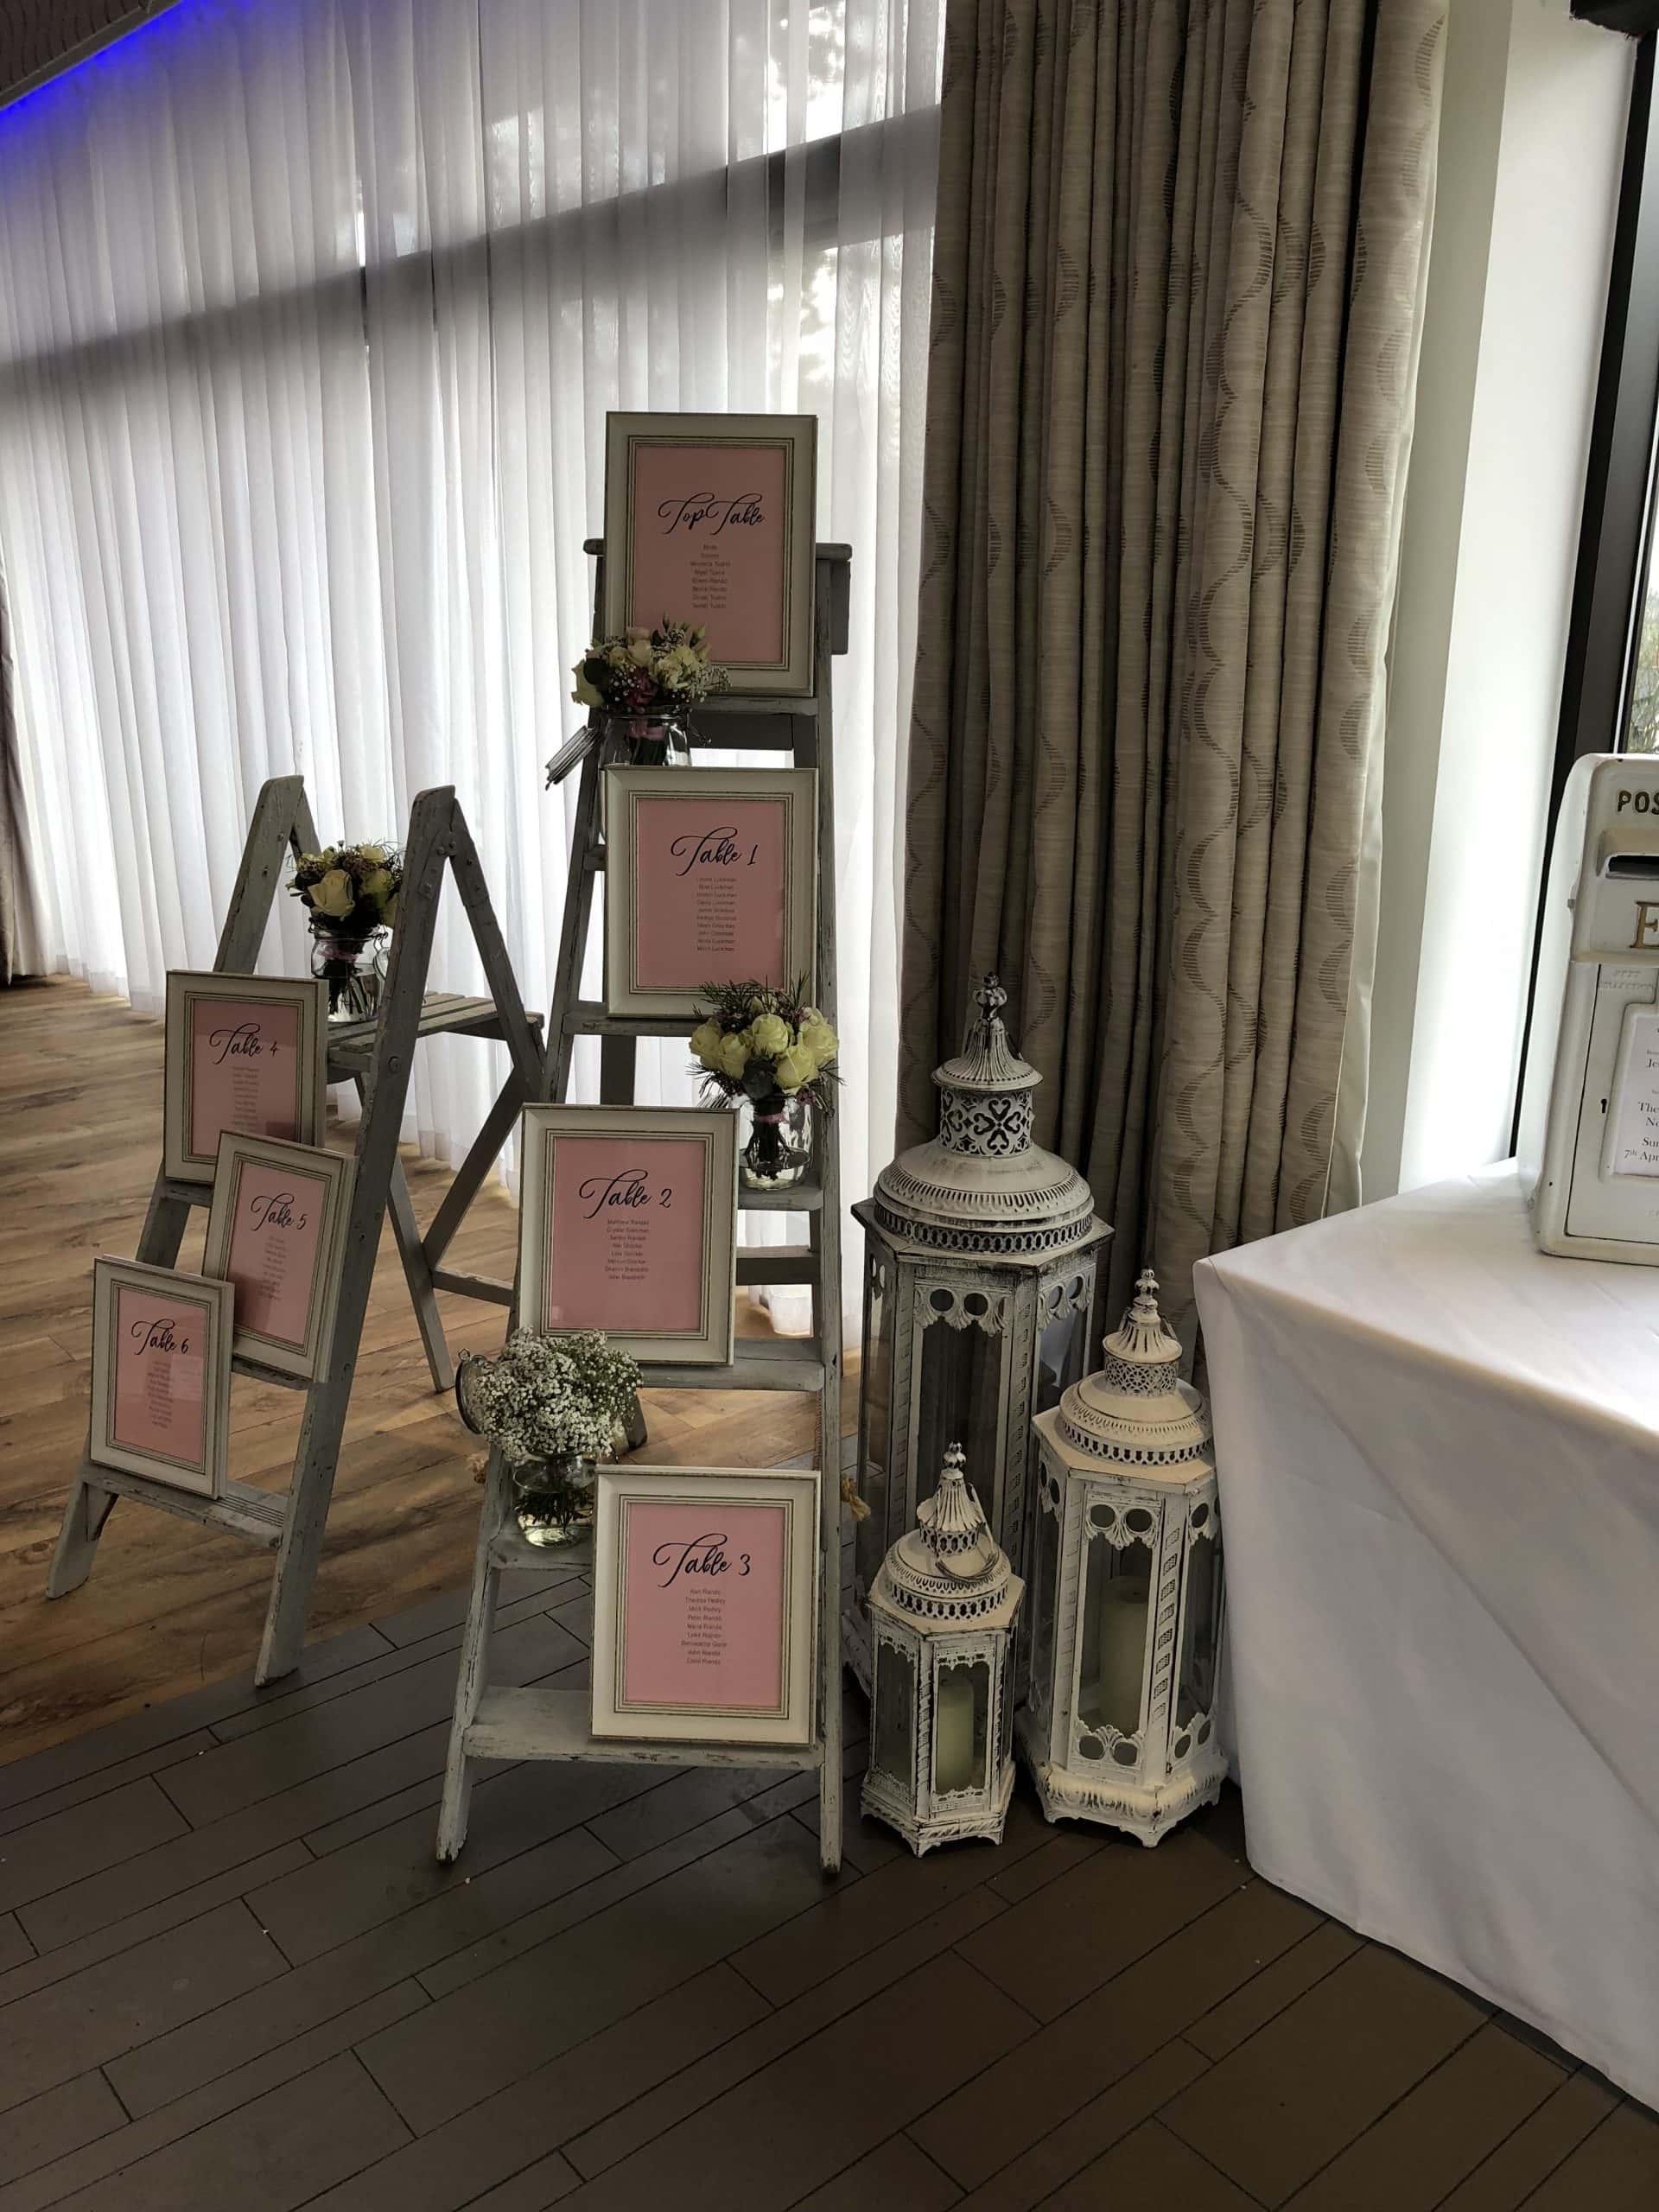 Ladder Seating Plan Complete with Lantern Arrangement